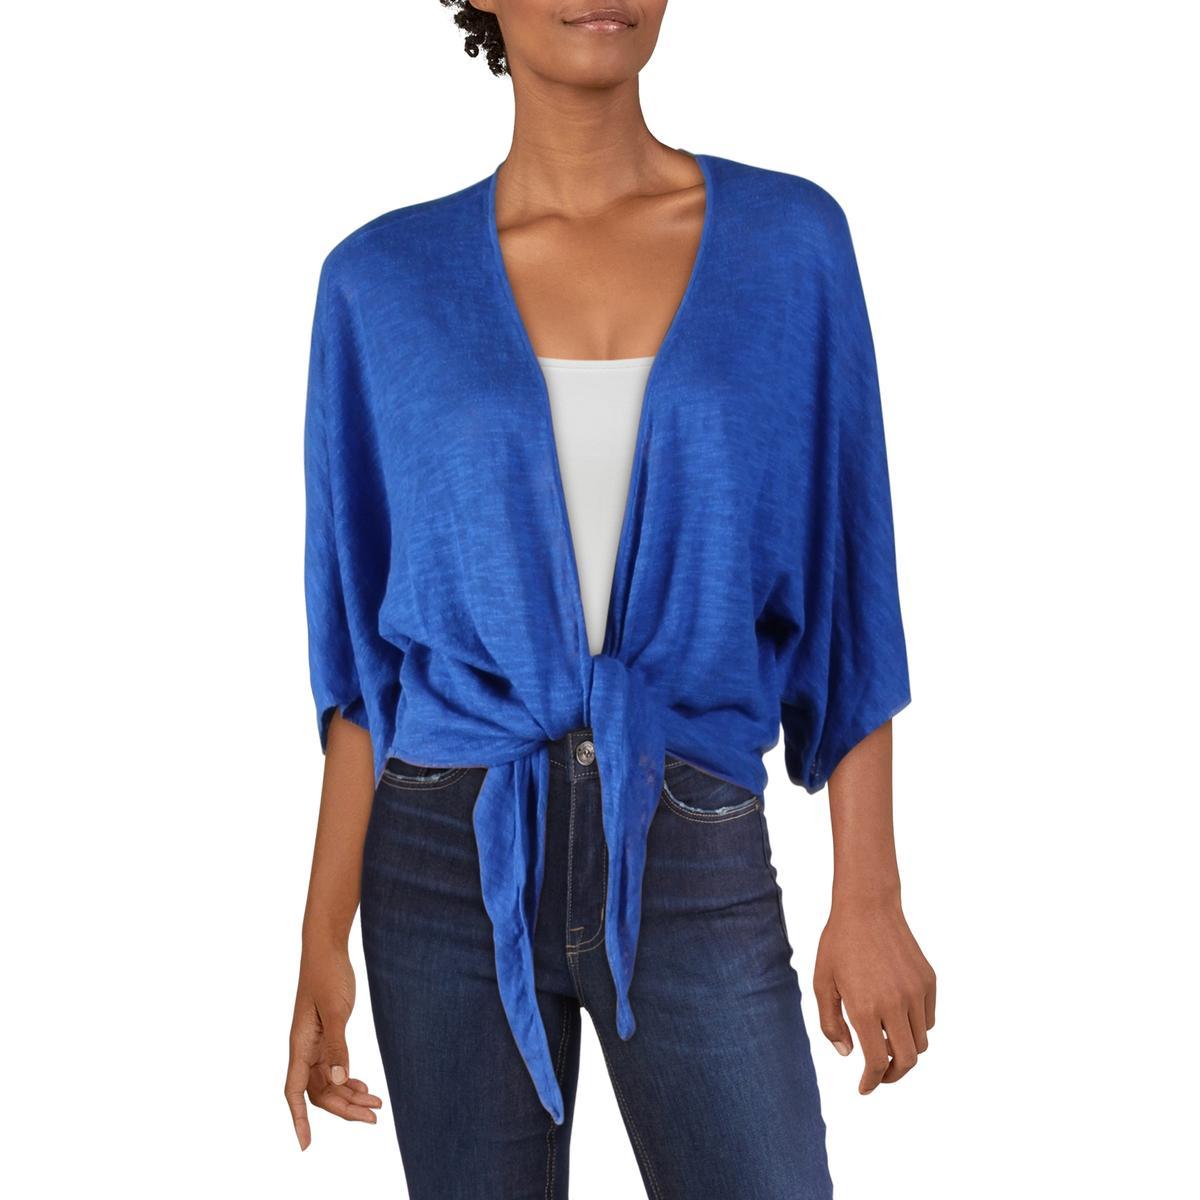 Alfani Womens Blue Satin Floral Shirt Blouse Top L BHFO 8143